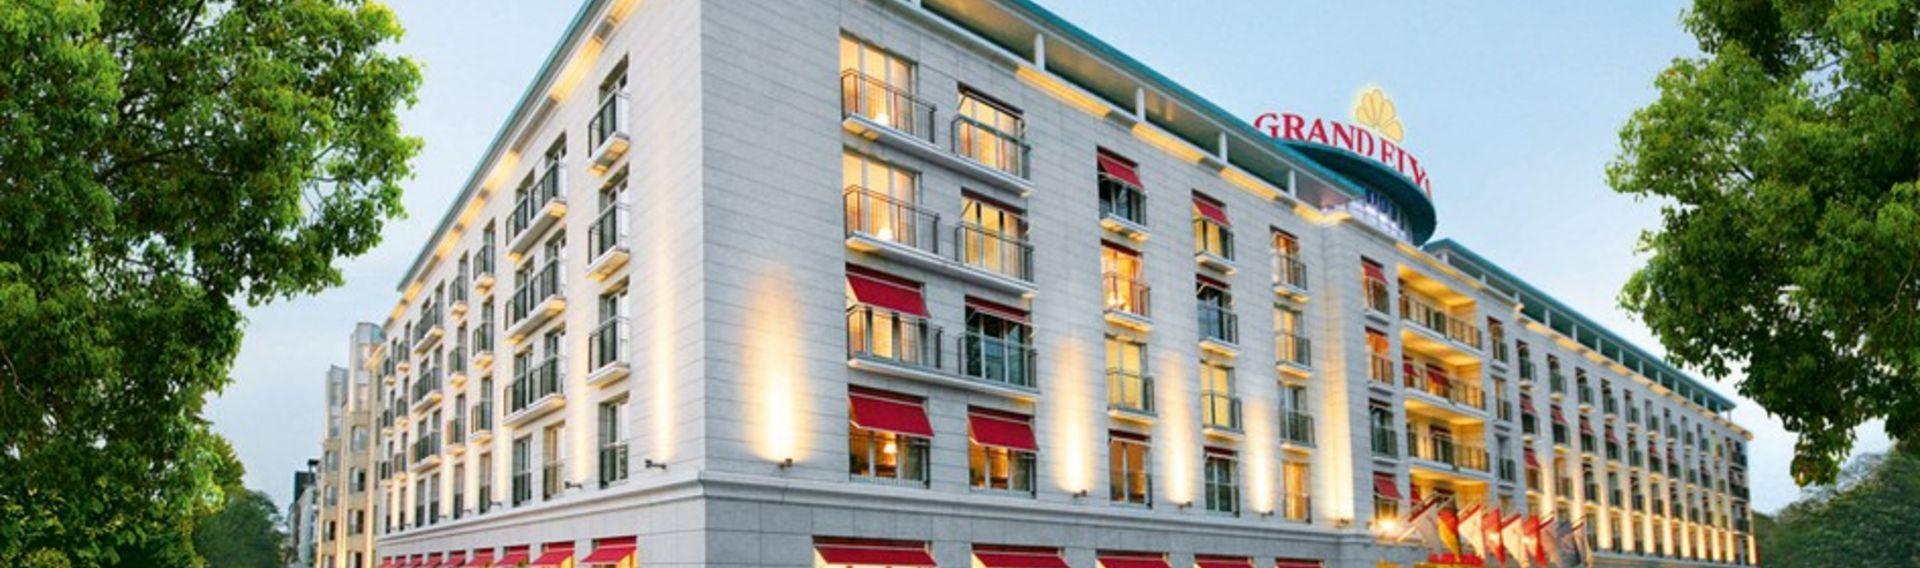 5 Sterne Hotel Hamburg – Grand Elysée